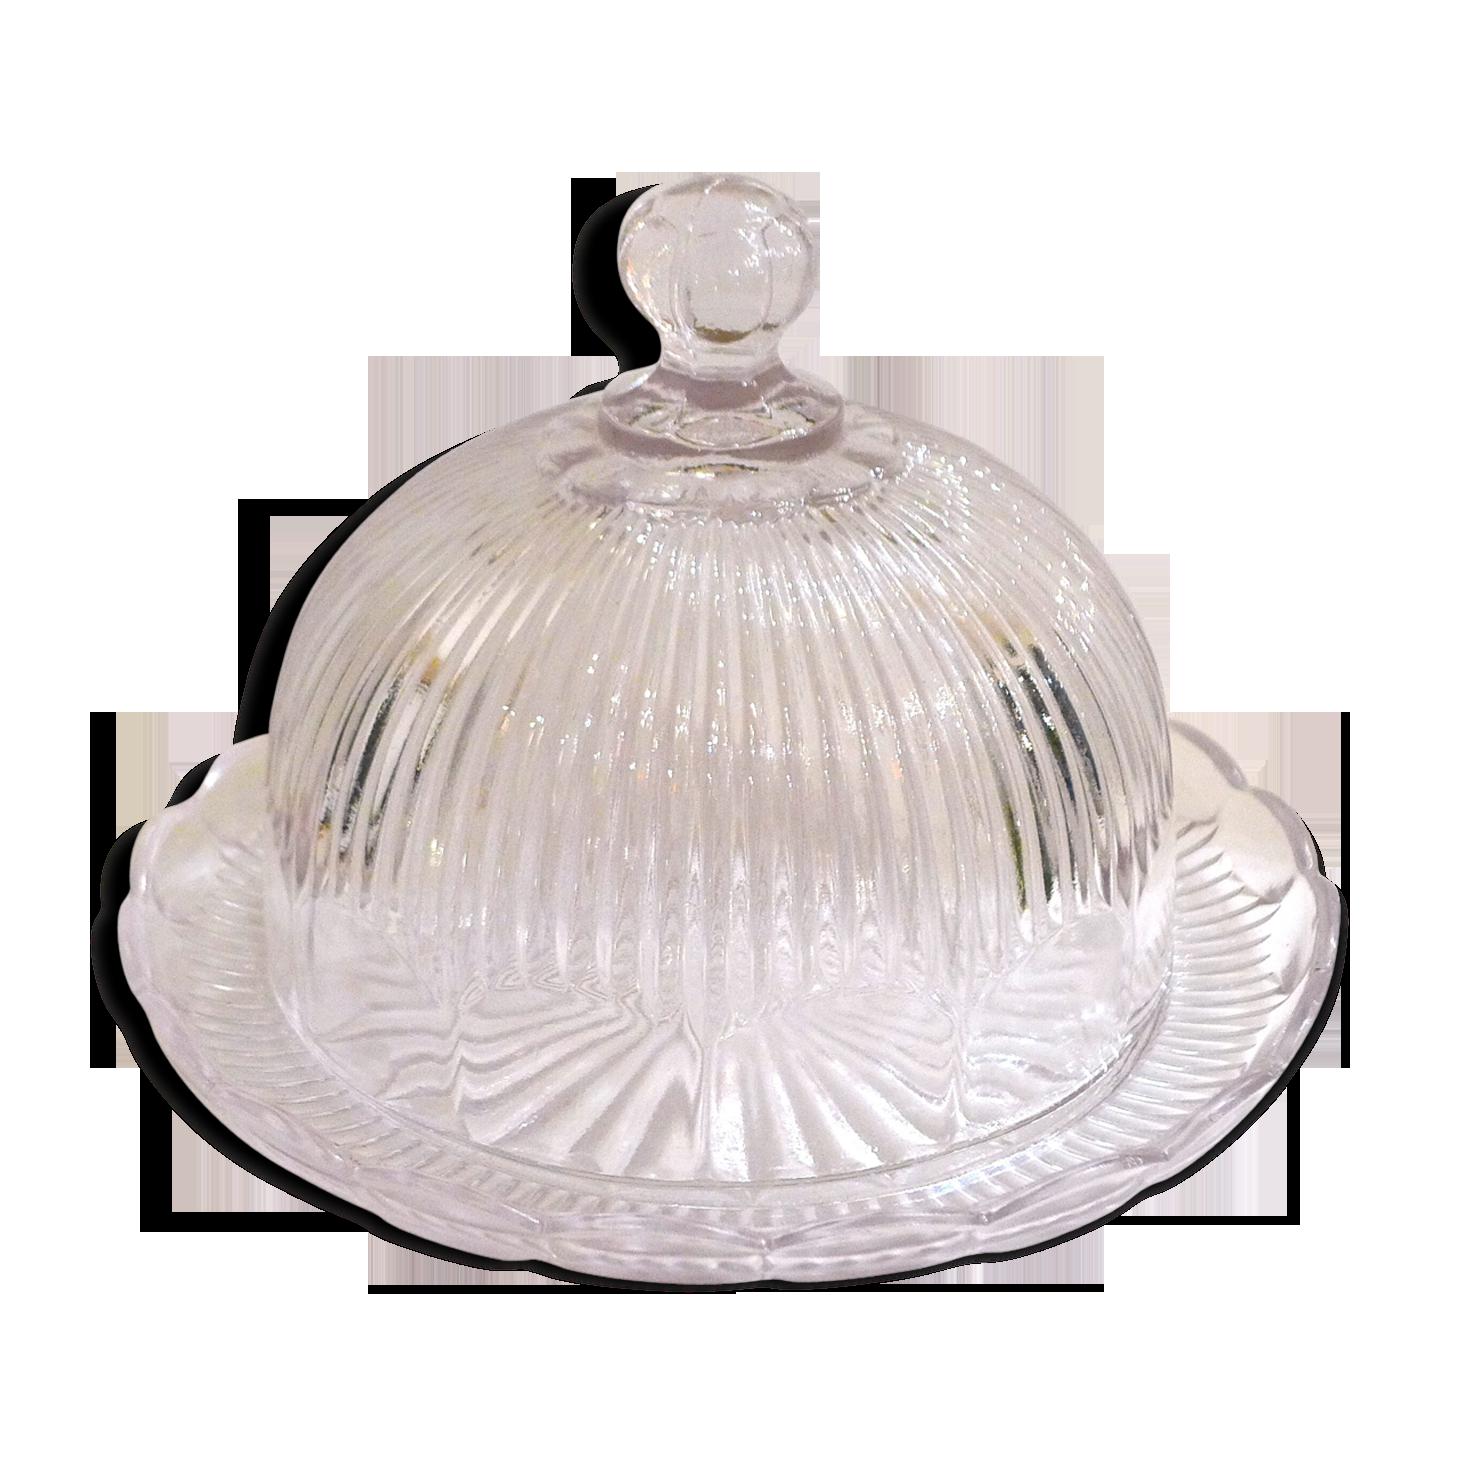 Écran Verre Gâteau Cupcake Dome Cover cloche diamètre 29.5 cm